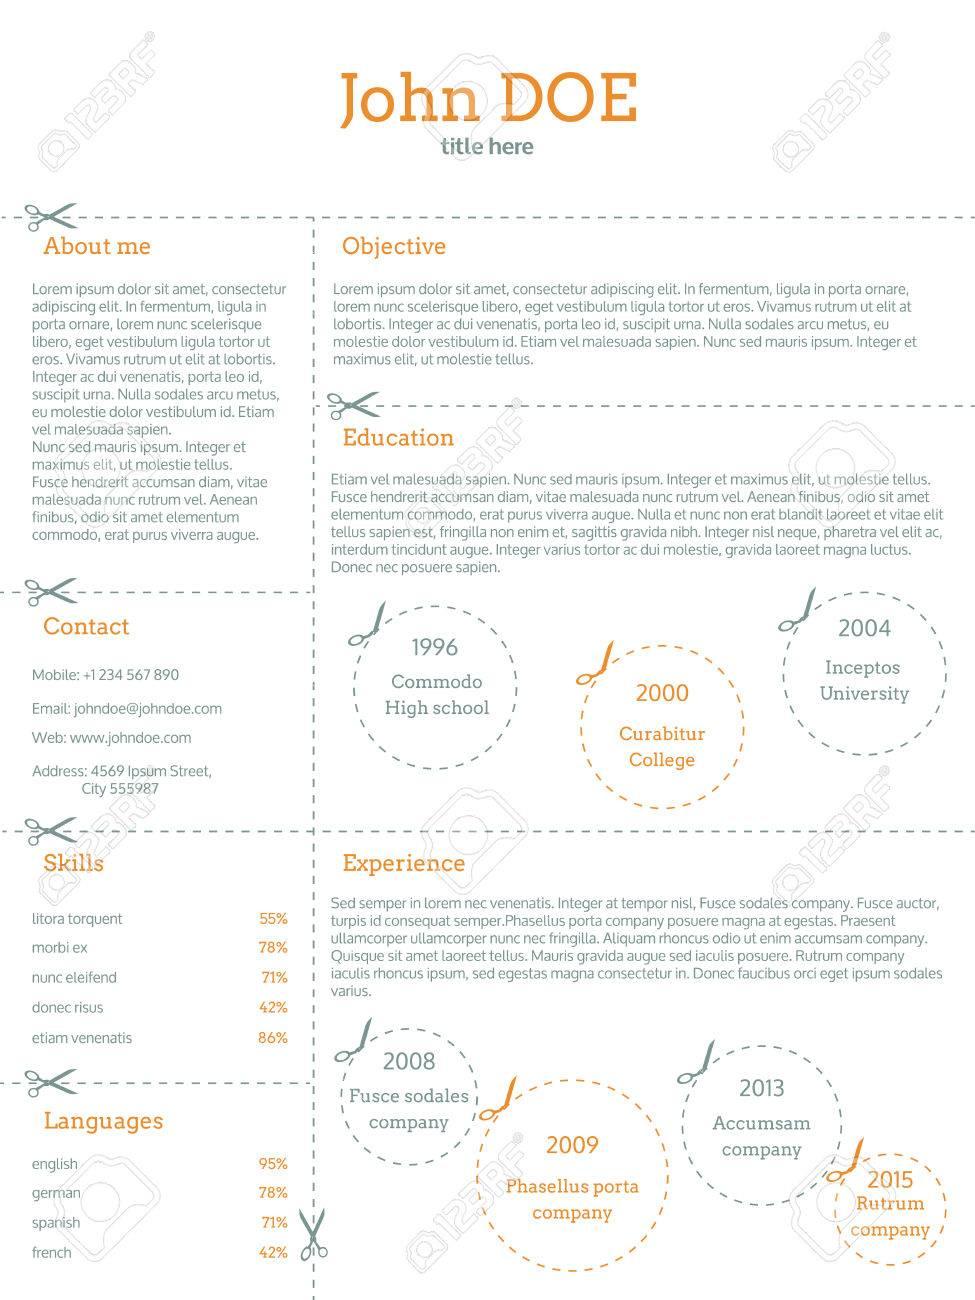 cv resume curriculum vitae template design with cutable categories    vector   cv resume curriculum vitae template design   cutable categories